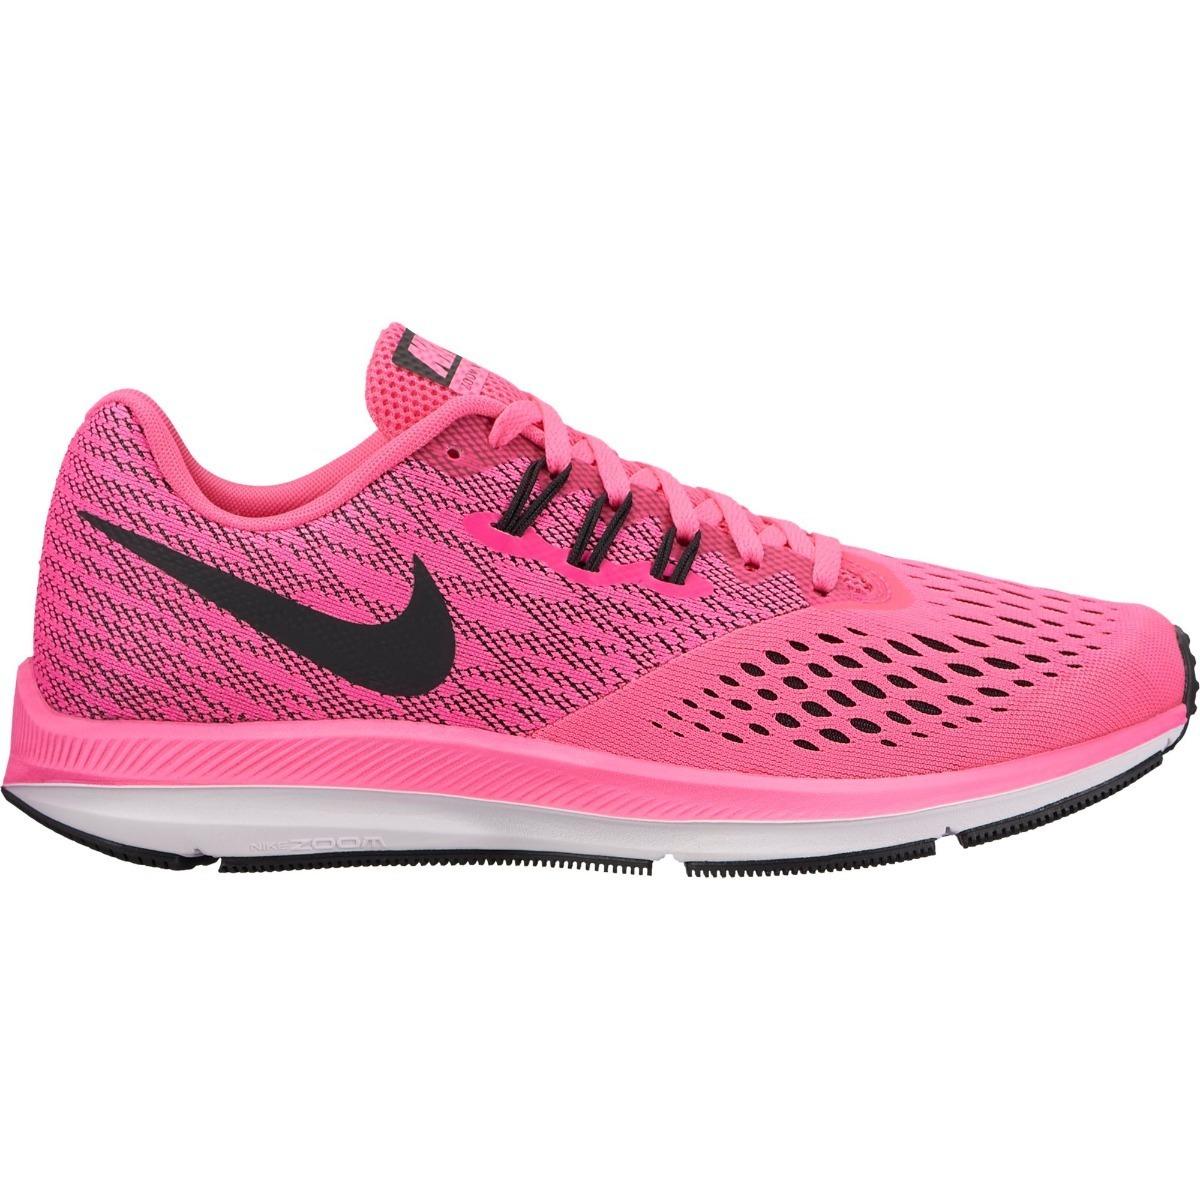 Tênis Nike Wmns Revolution 4 CinzaRosa Compre Agora Dafiti Brasil d0133d02d0553